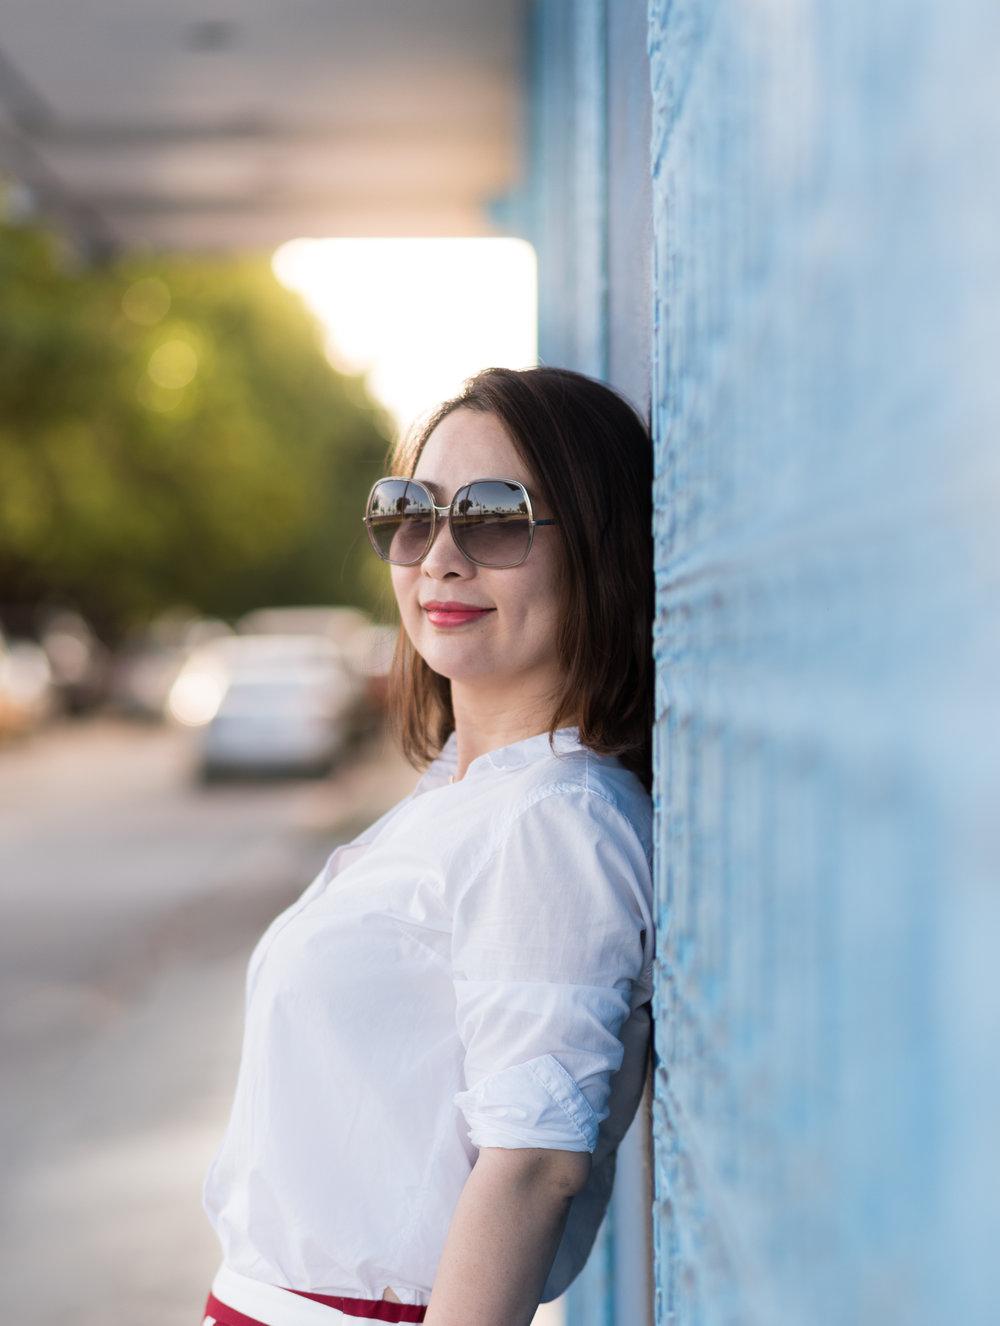 woman-model-agana-guam-roxanne-augusta-photographer-4.jpg